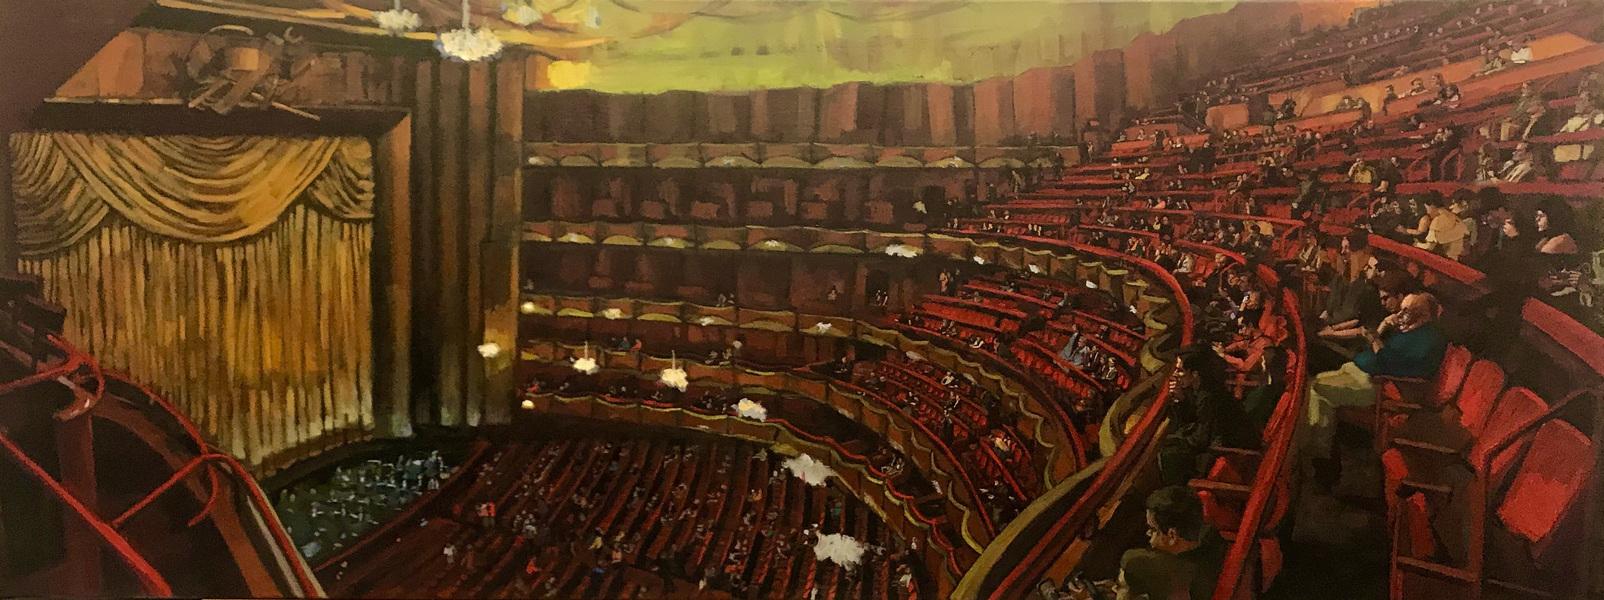 Danny Glass - Metropolitan Opera